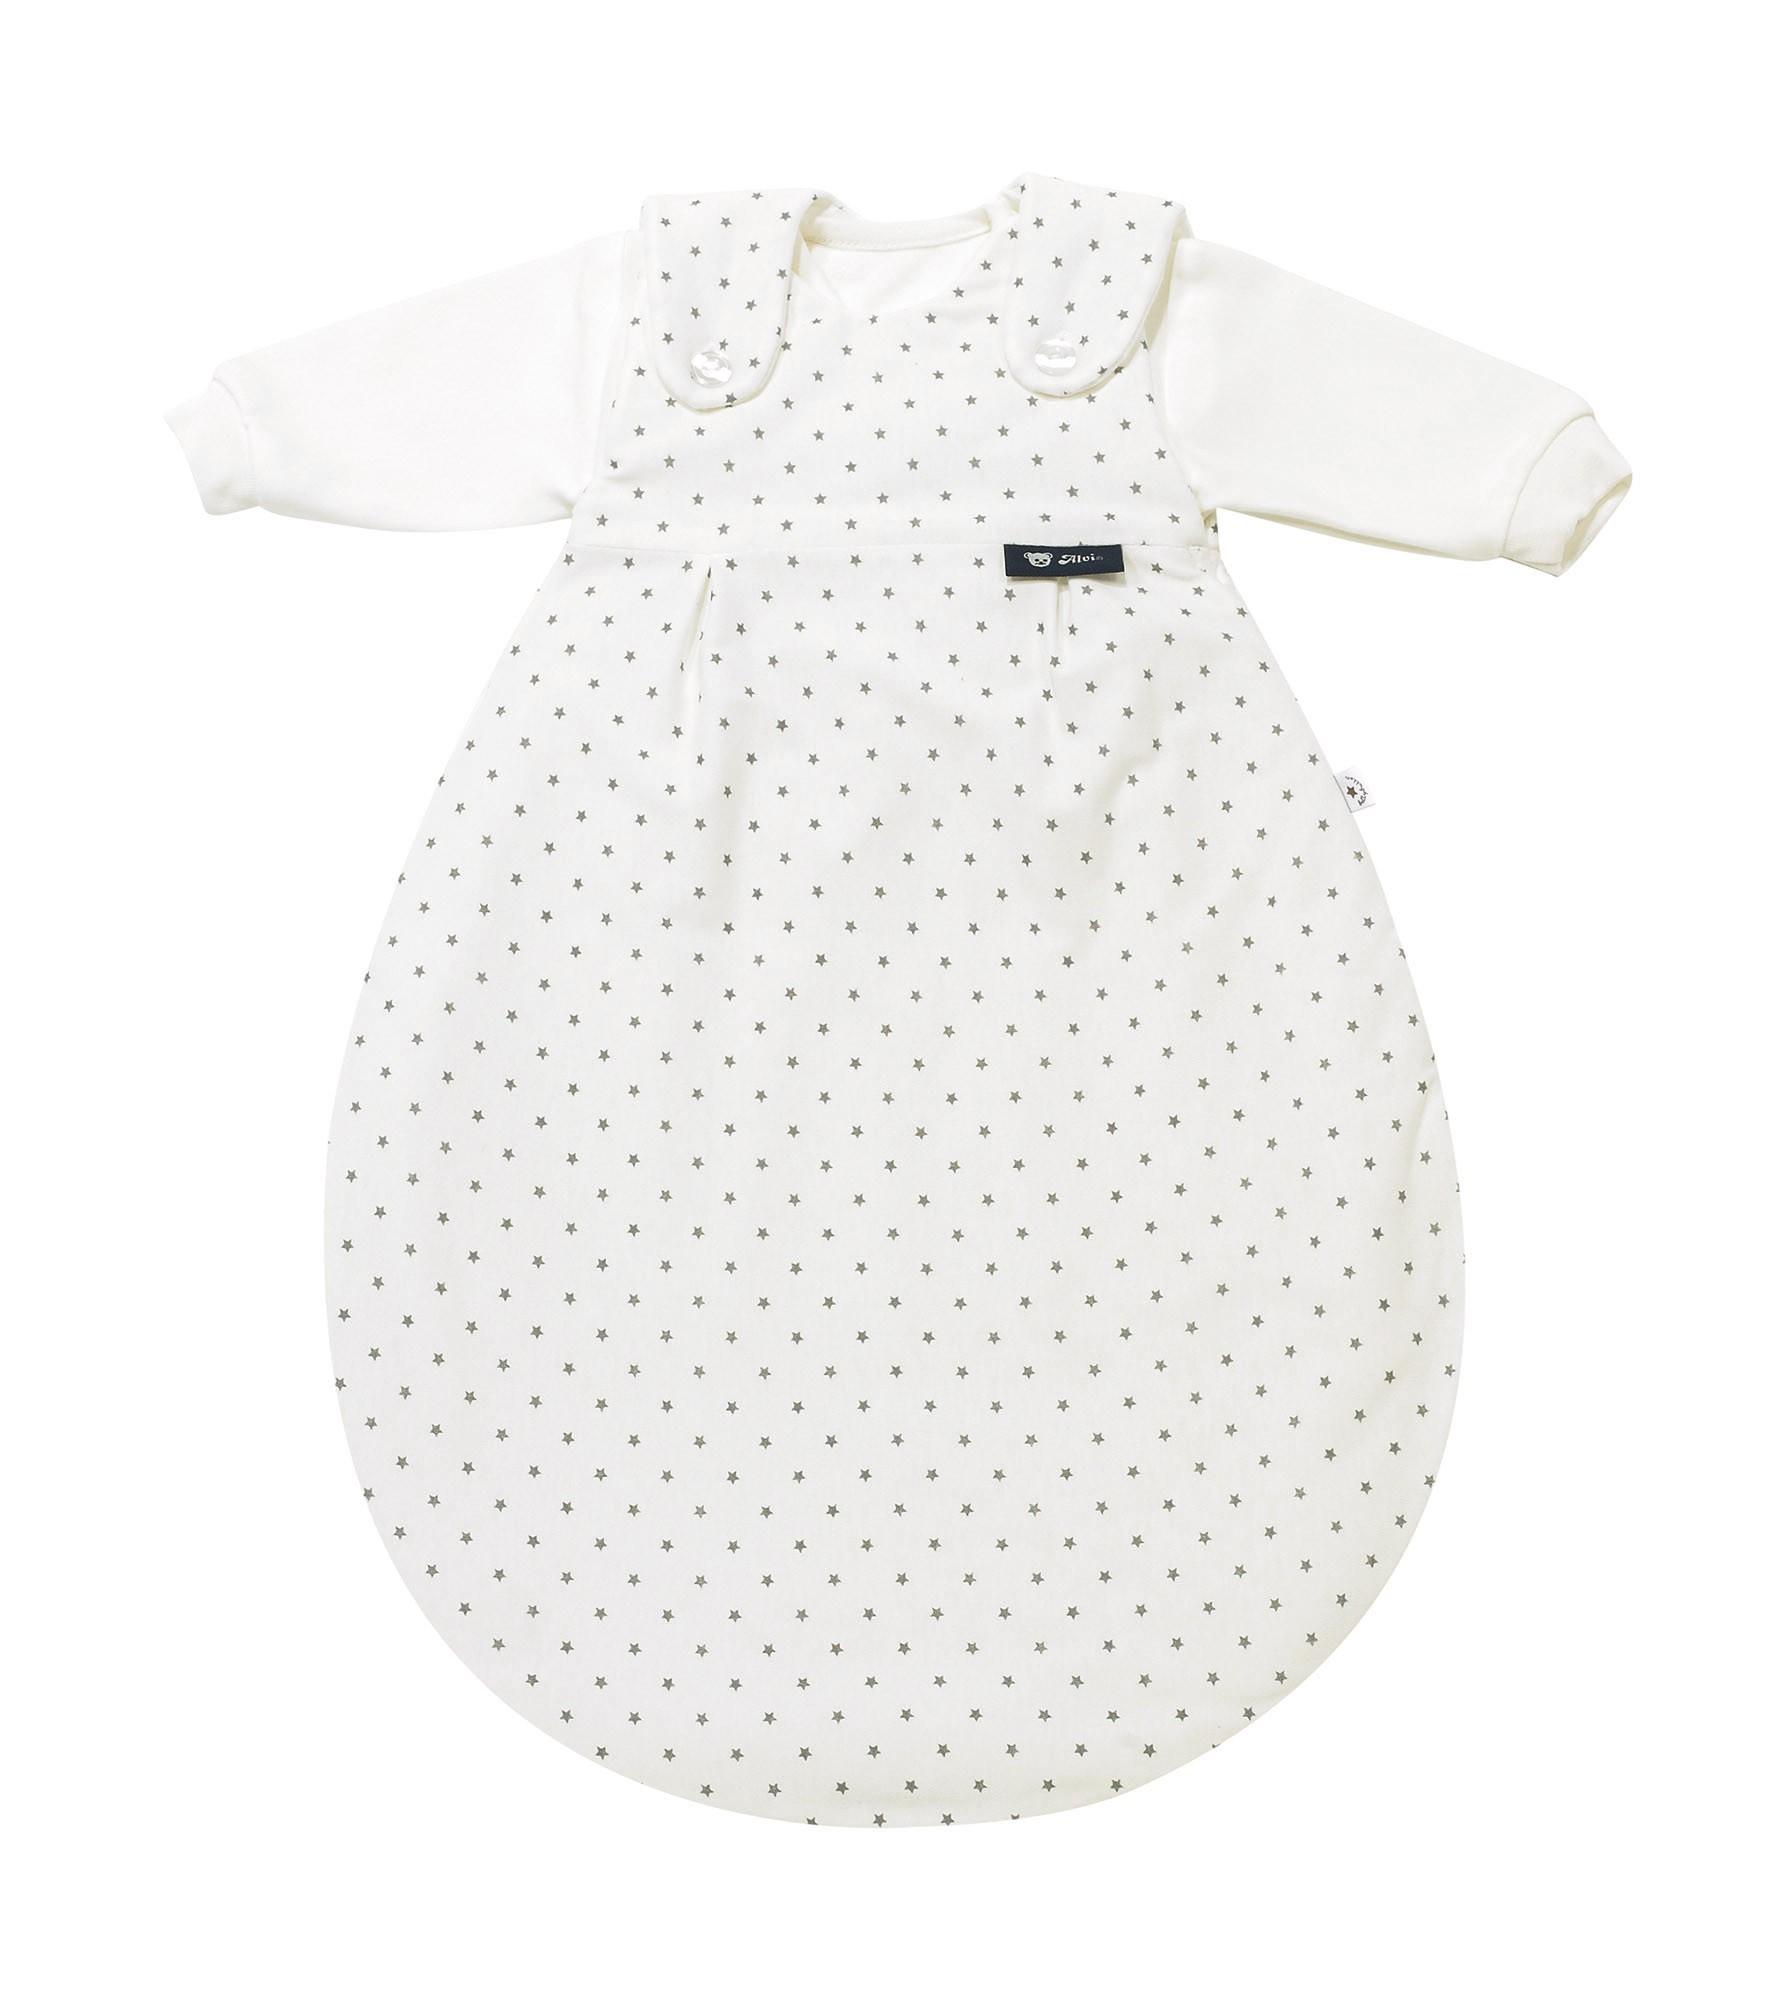 Alvi Baby Mäxchen by bellybutton 3tlg. grey little stars